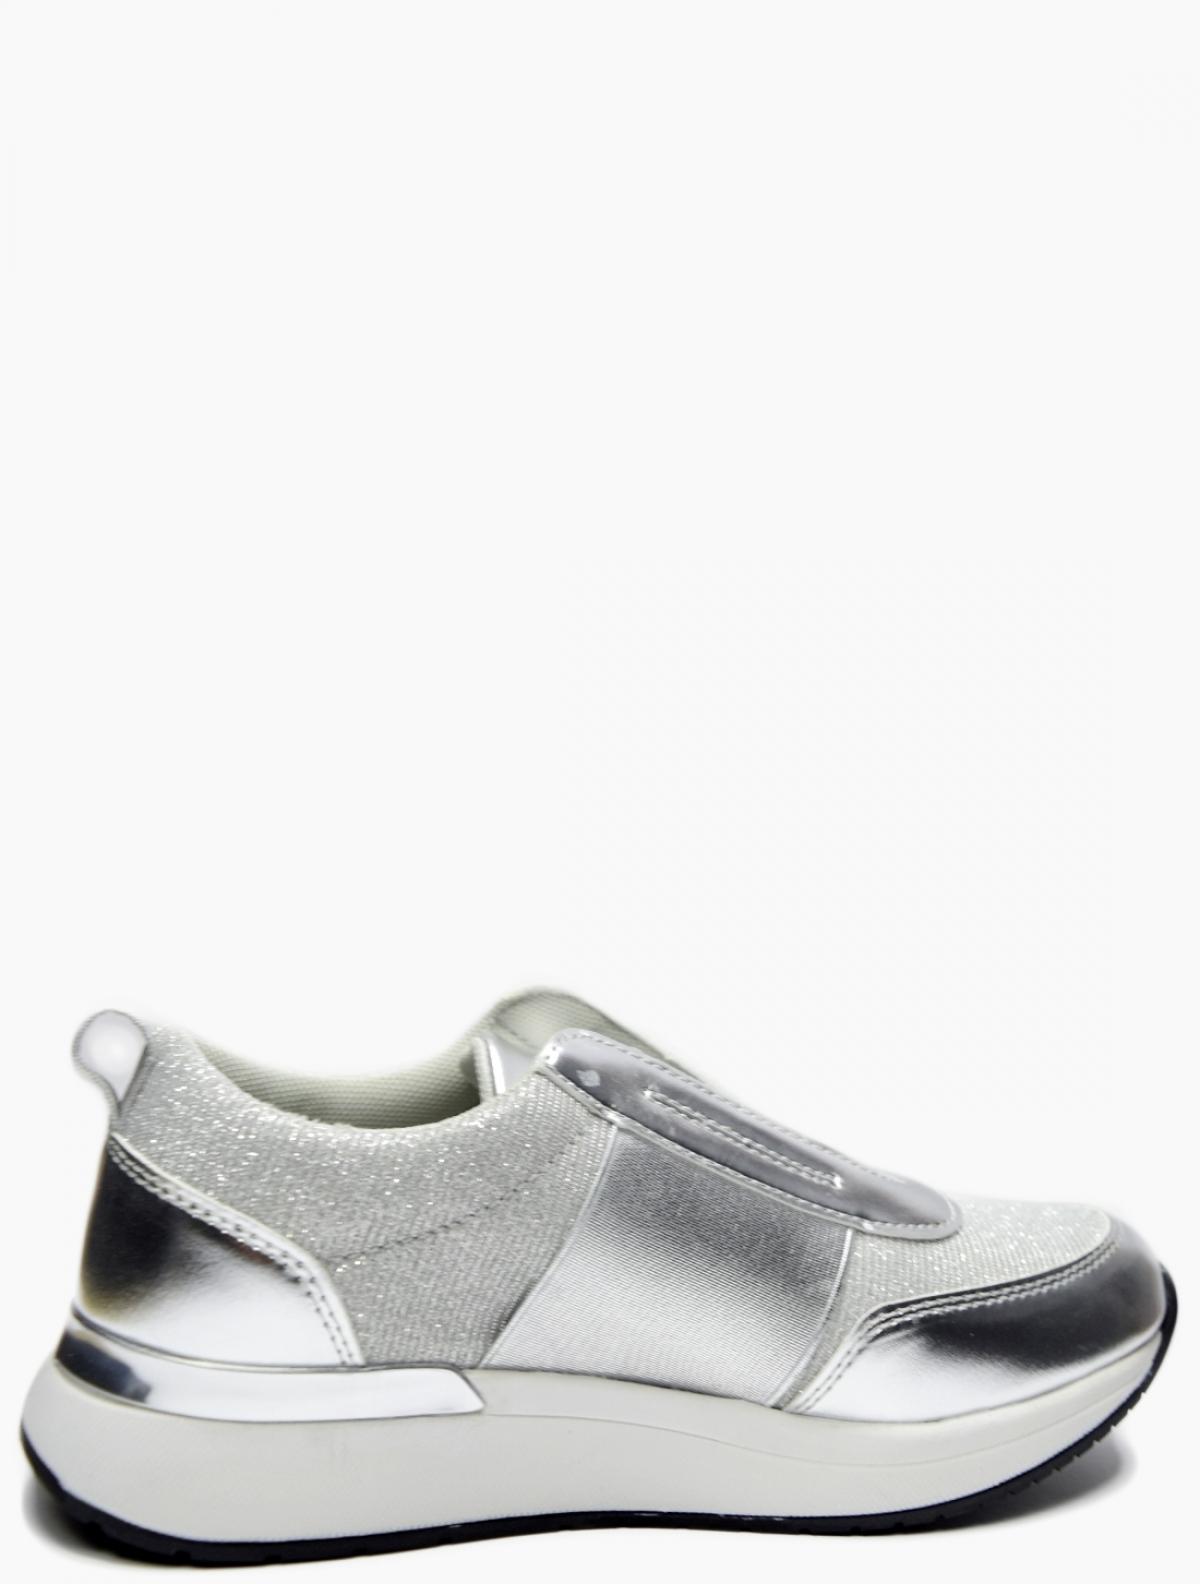 Respect VK54-118706 женские кроссовки